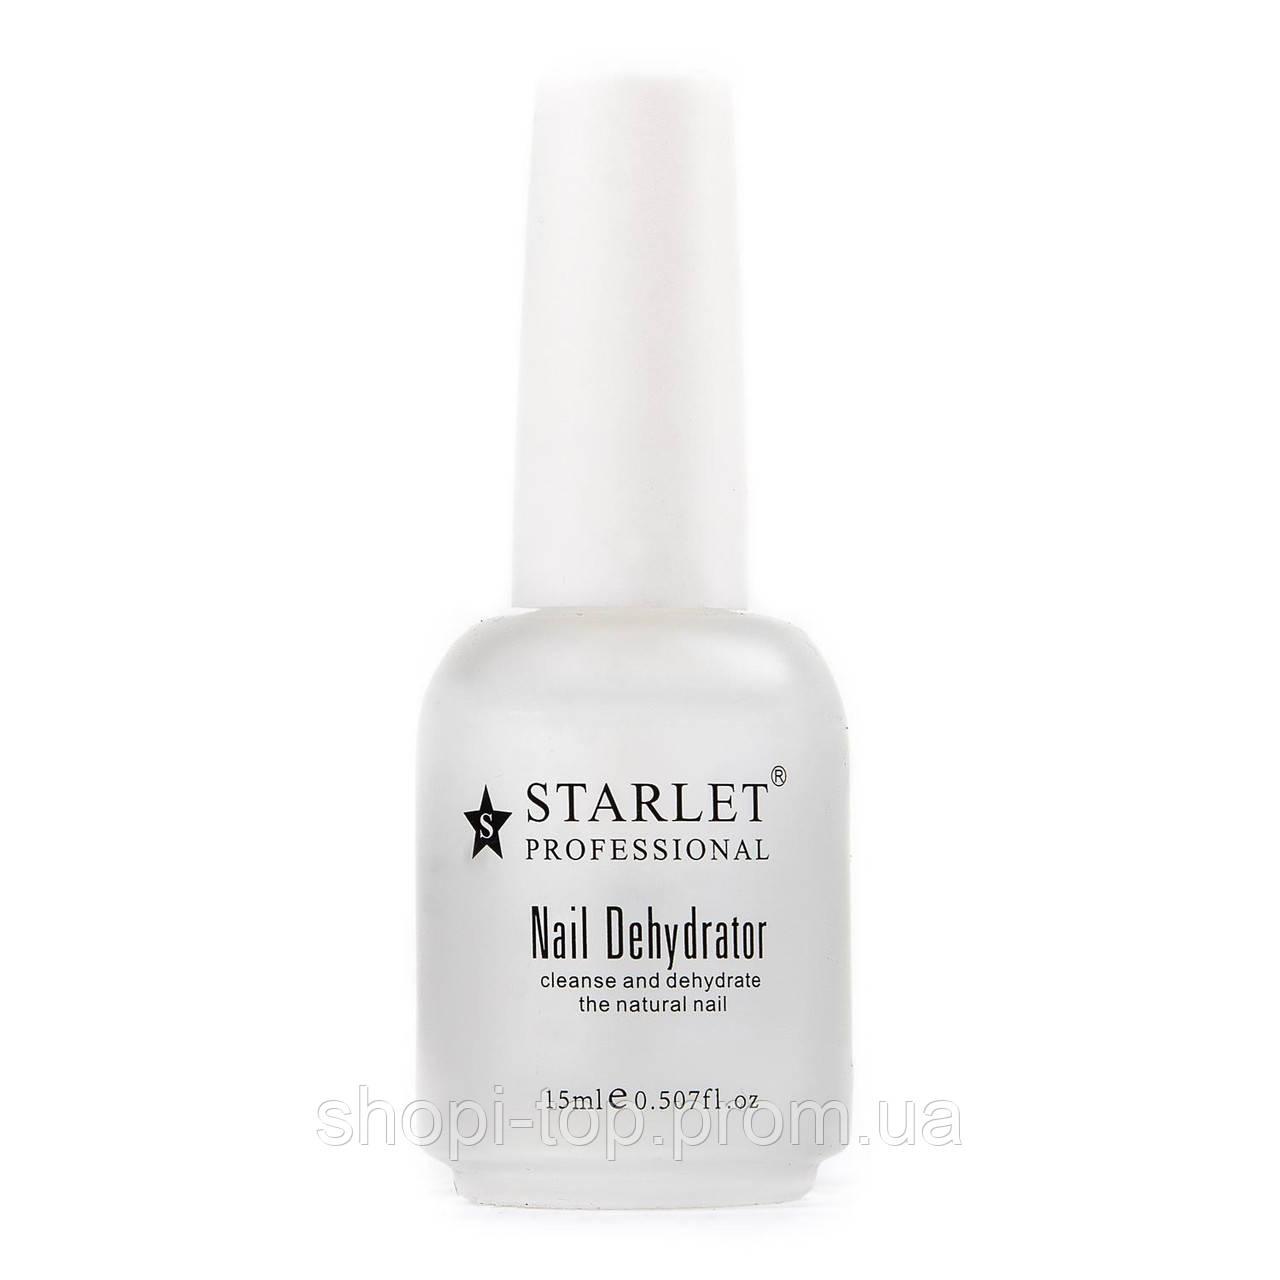 Starlet Nail Dehydrator Дегидратор для ногтей, 15мл